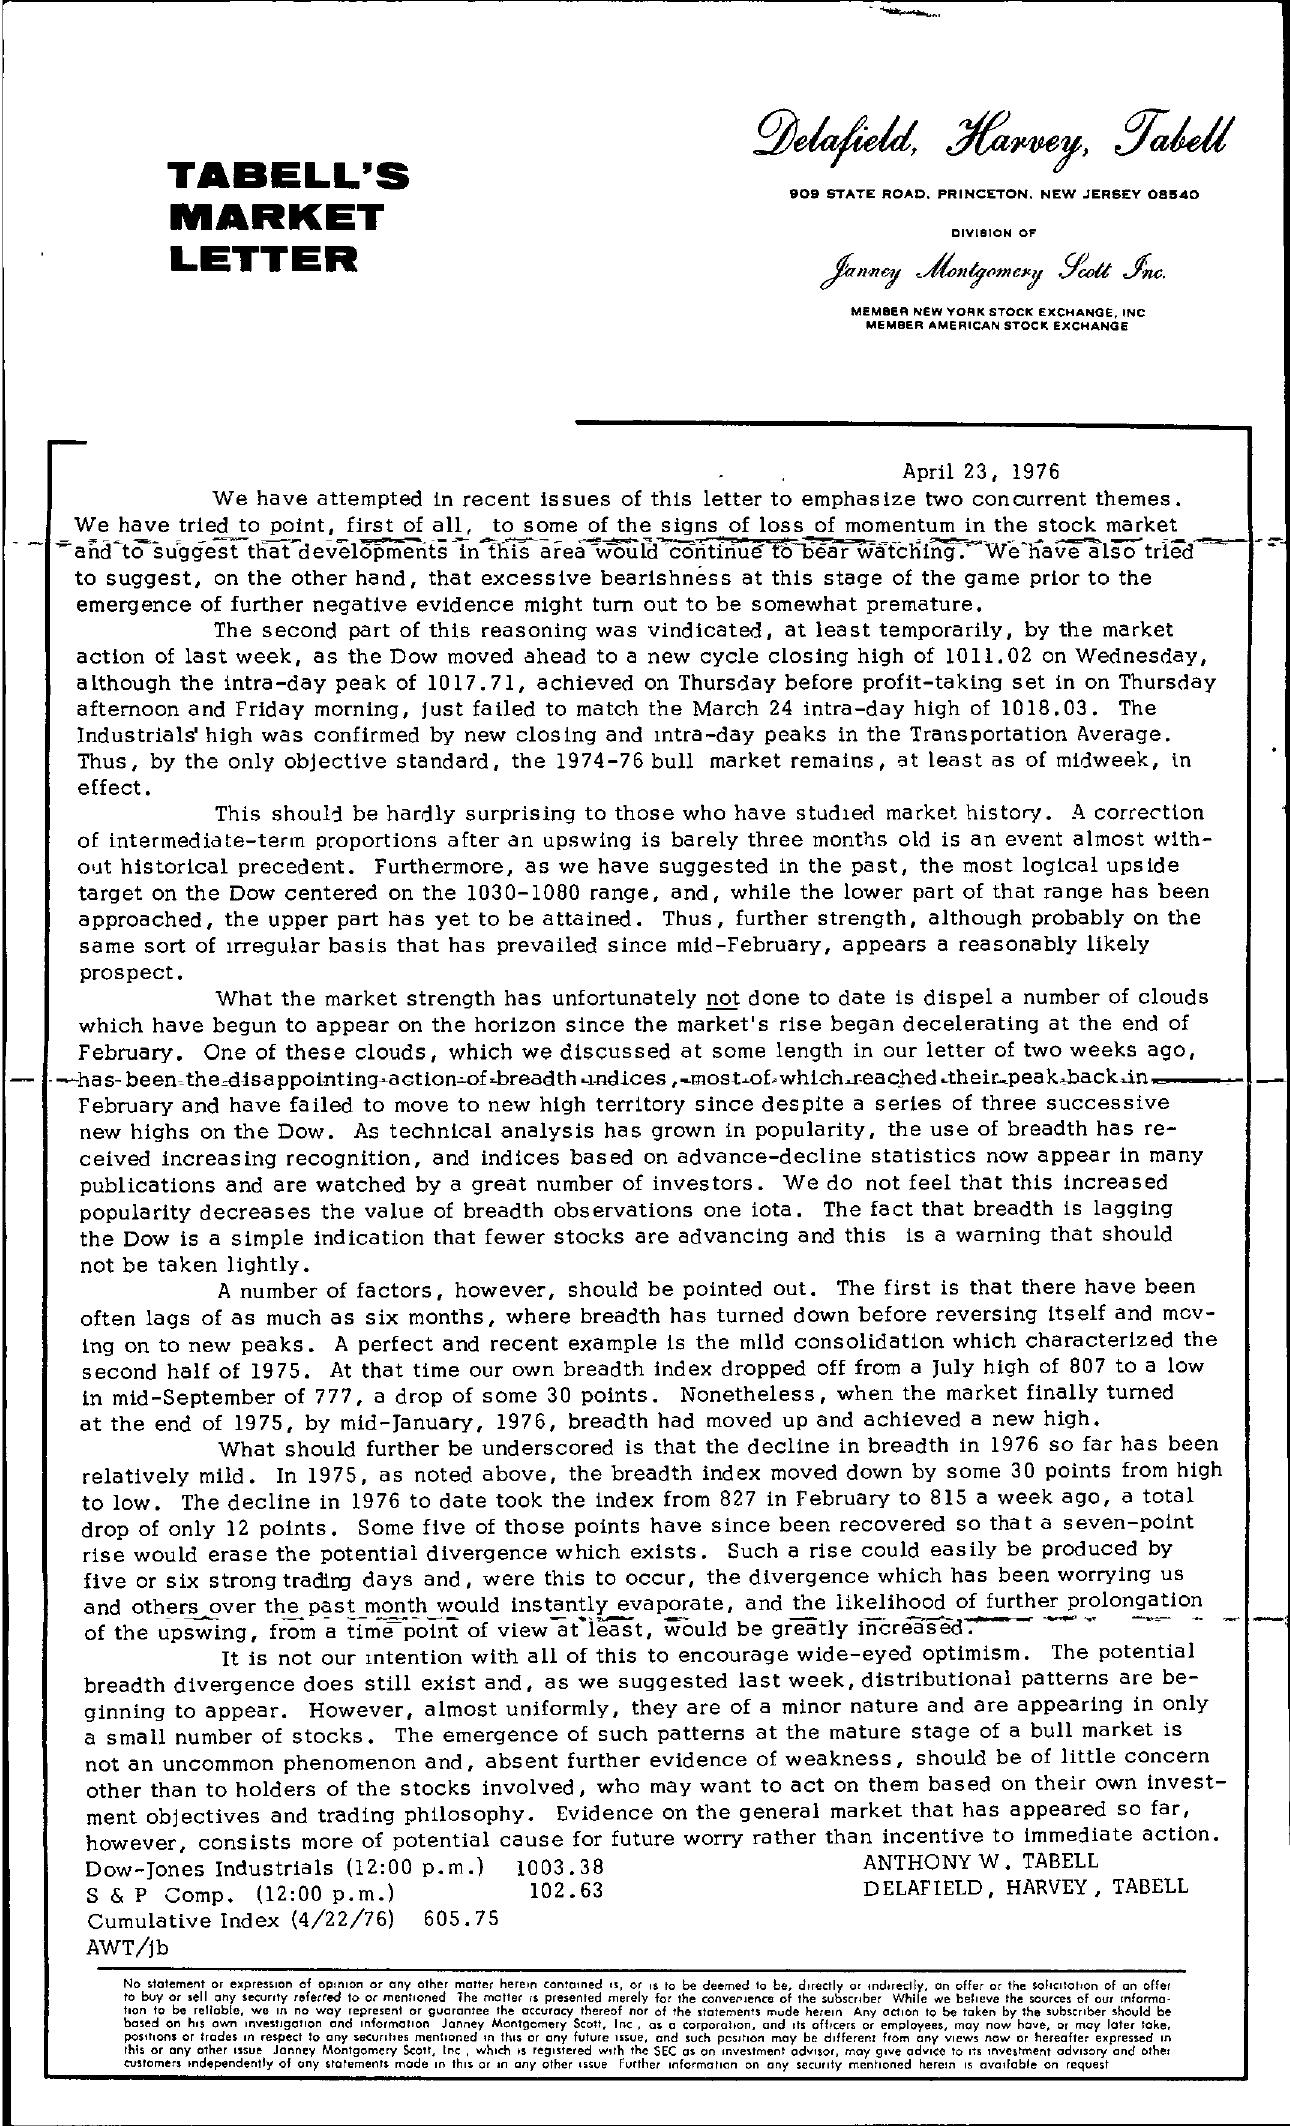 Tabell's Market Letter - April 23, 1976